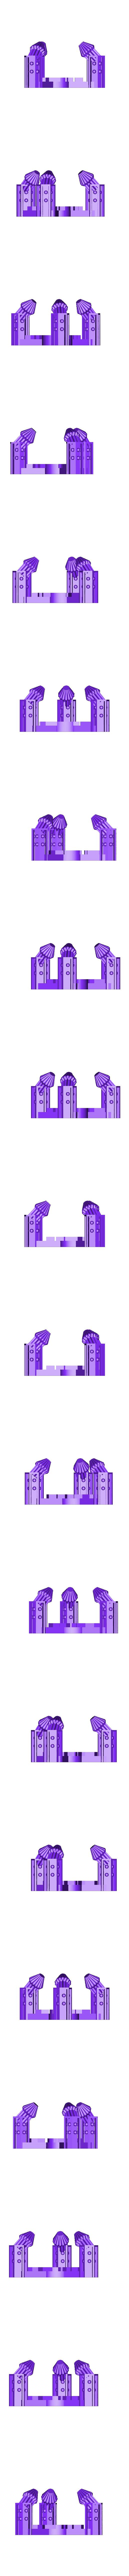 Borg_6.stl Download free STL file Borg prosthetic arm • 3D printer template, poblocki1982